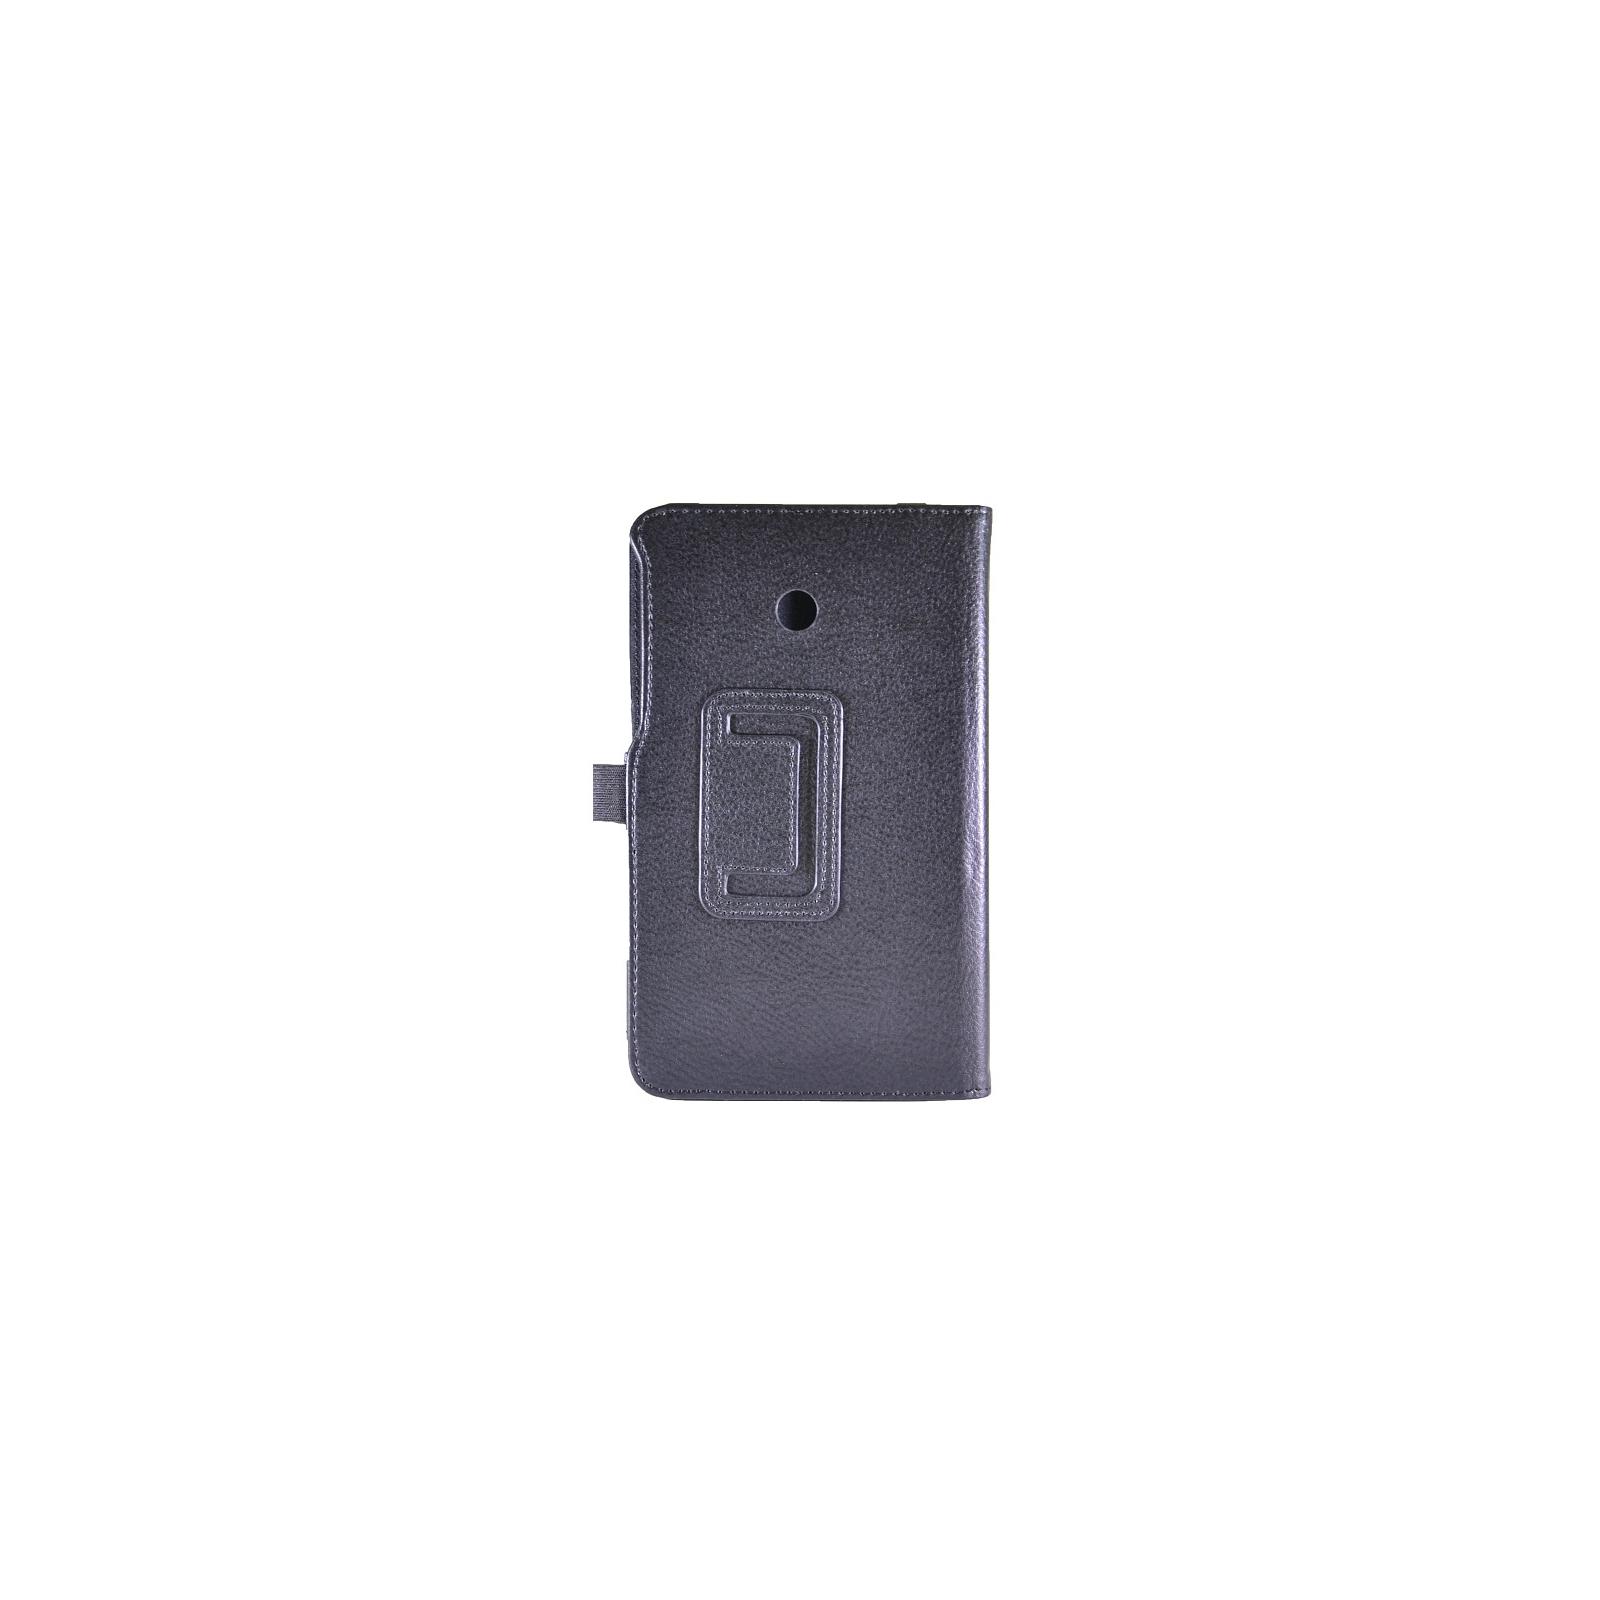 "Чехол для планшета Pro-case 7"" Pro-case Asus 7"" MeMO Pad ME170 black (ME170b) изображение 2"